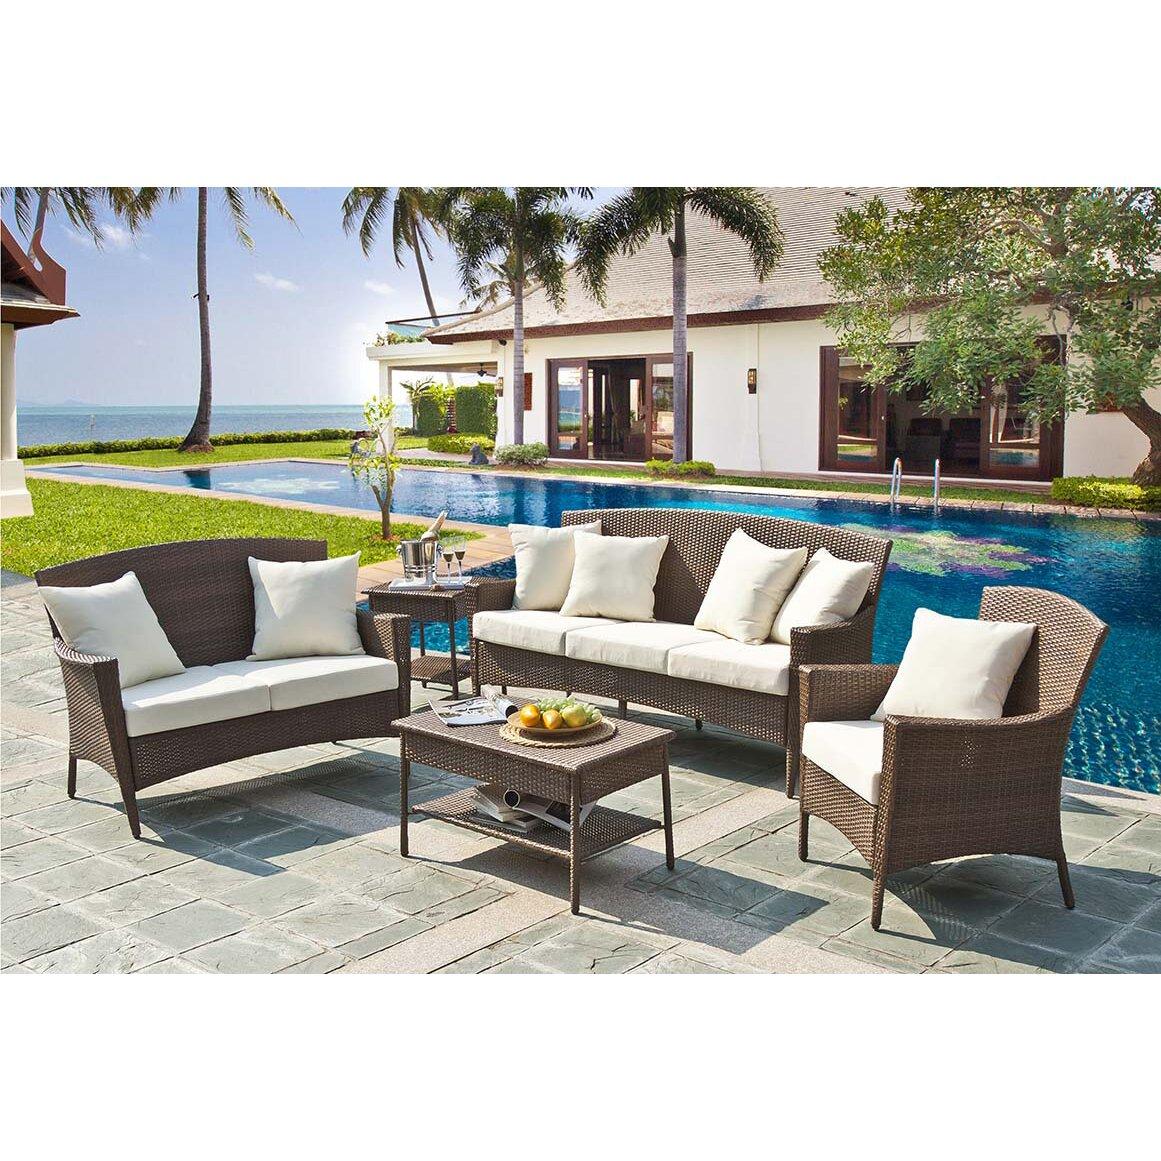 Panama Jack Key Biscayne Lounge Chair With Cushion